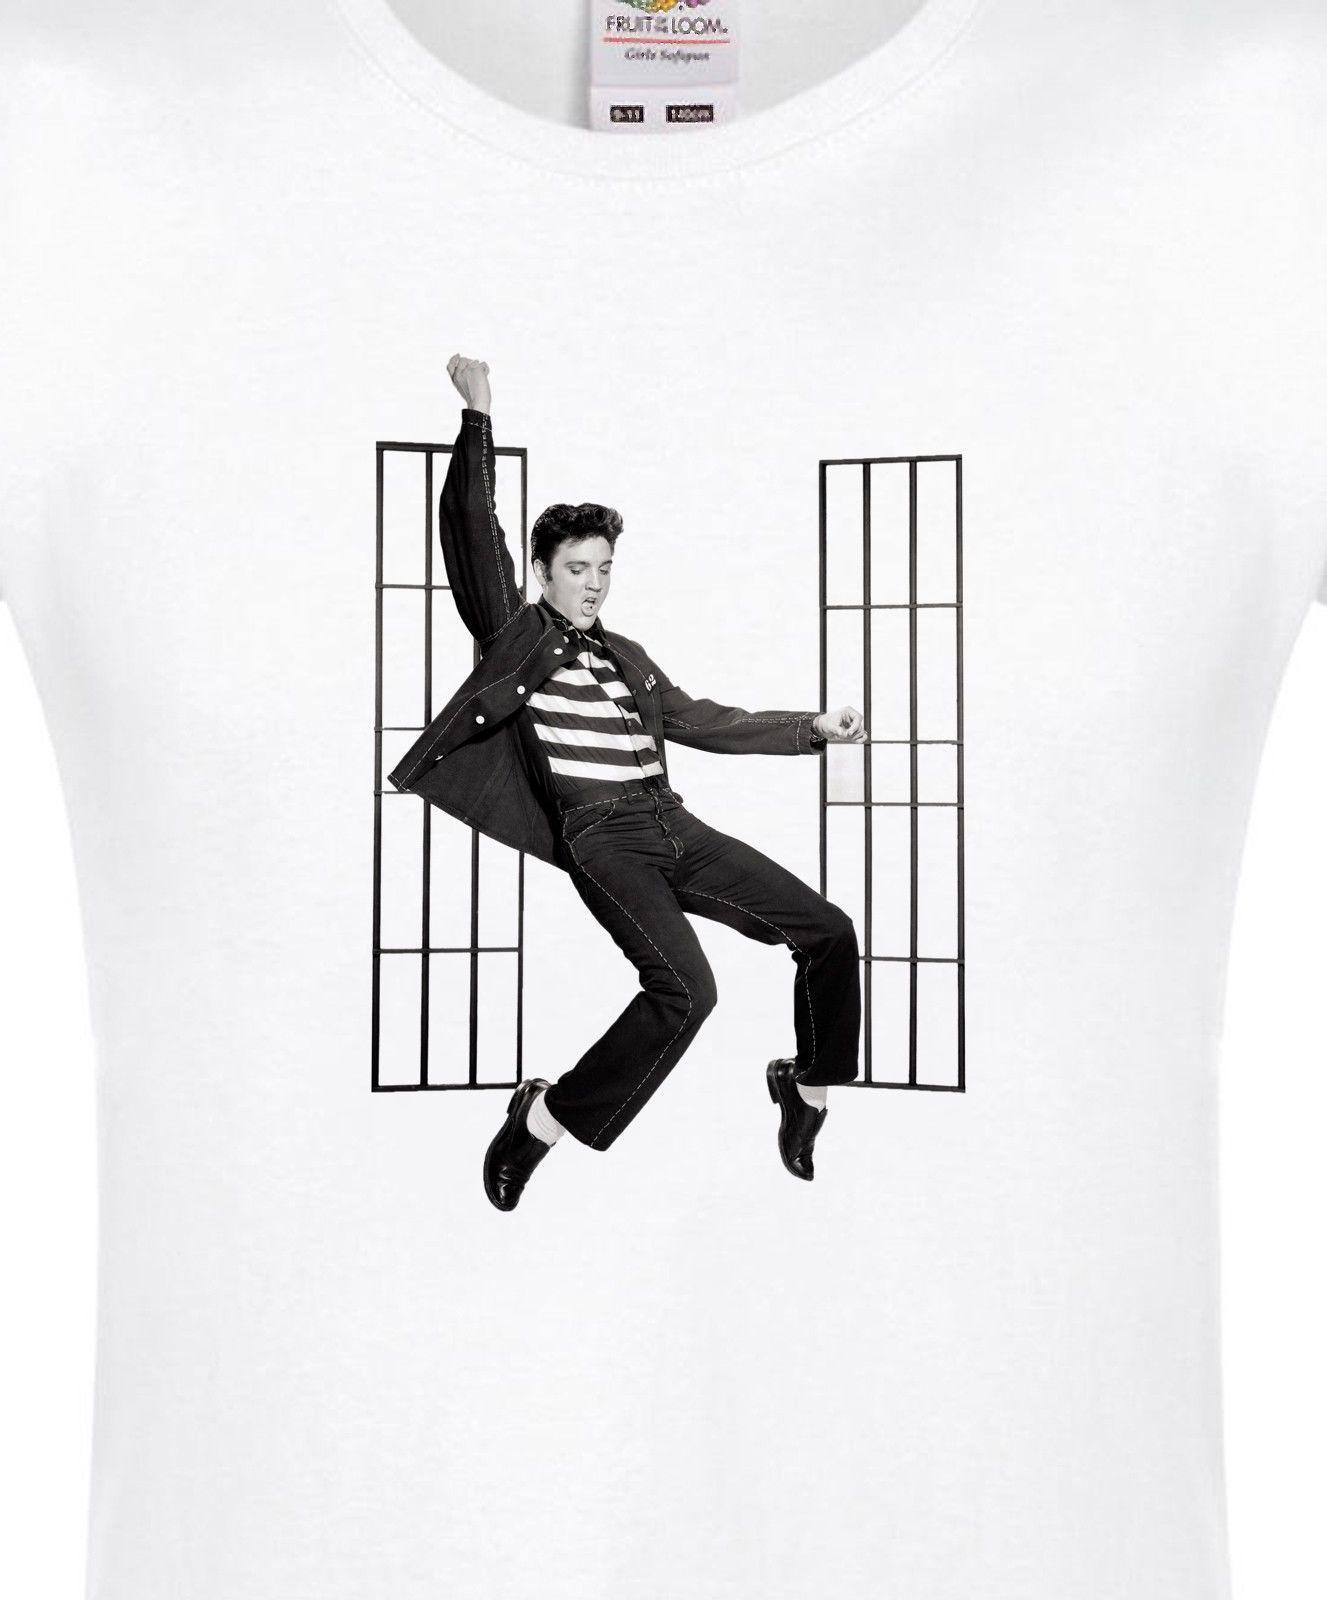 e55b40d21 ELVIS PRESLEY JAIL HOUSE ROCK WOMENS T SHIRT 100%COTTON MUSIC TEE LADY FIT  TOP Interesting T Shirts T Shirt Buy Online From Bincheng5, $12.02|  DHgate.Com